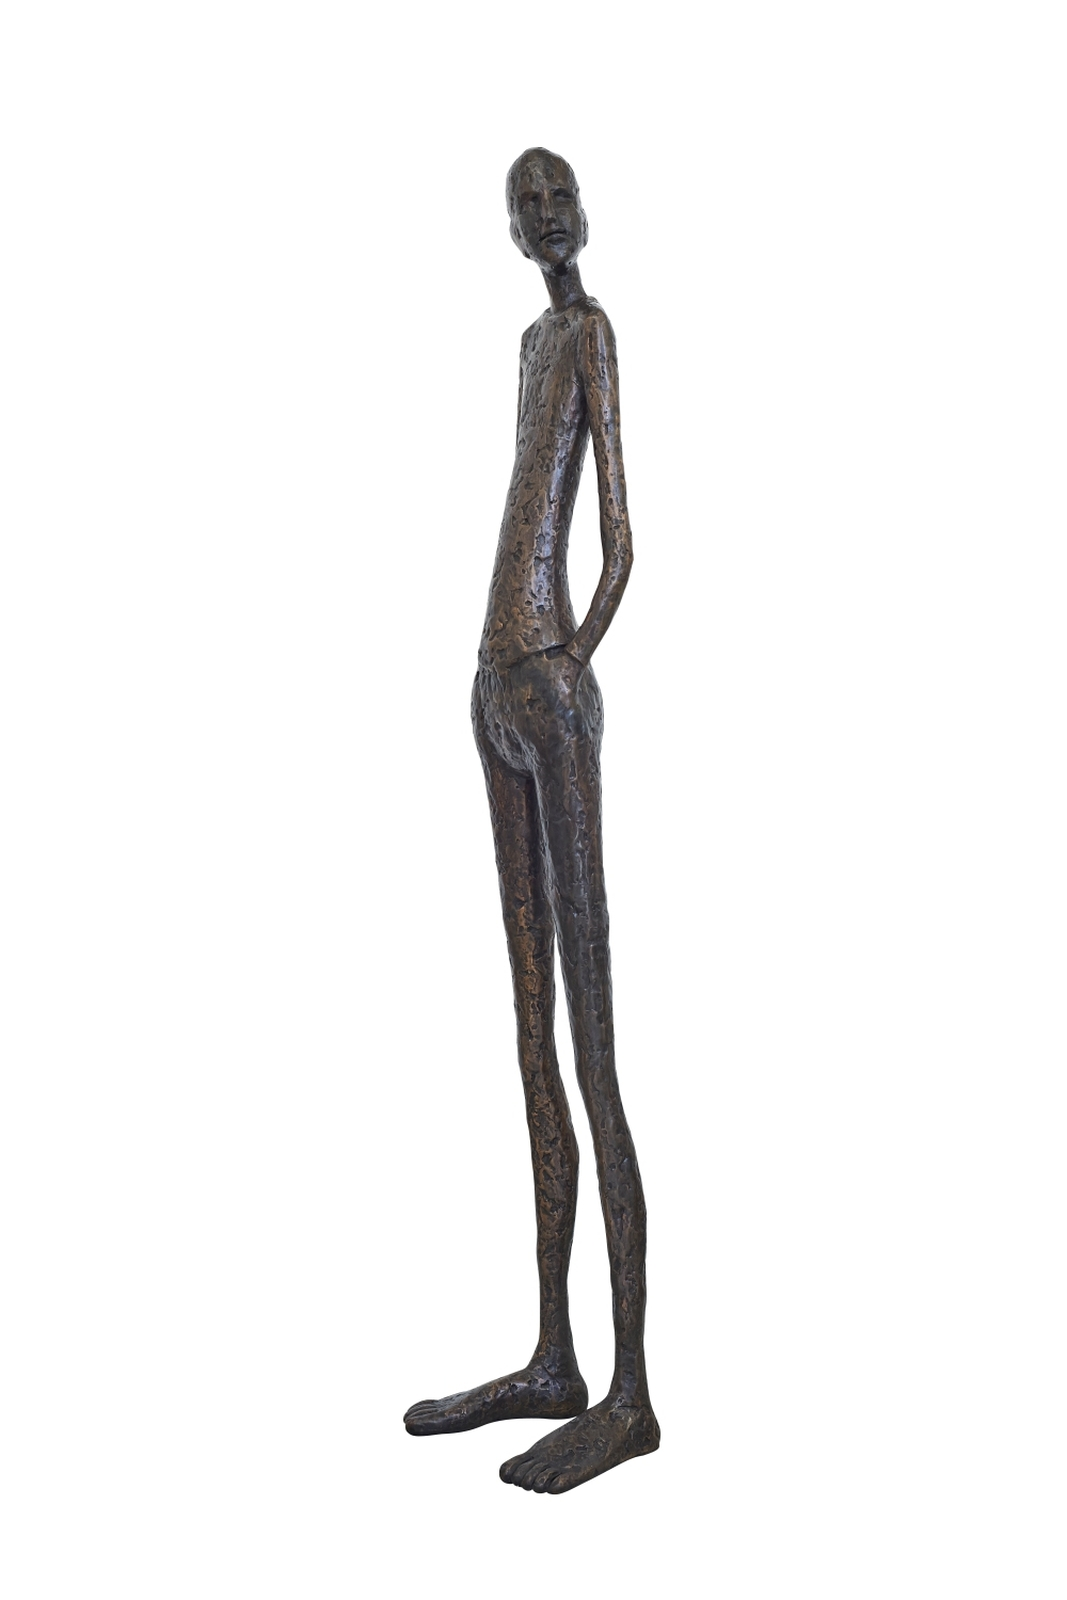 Flaneur Tina Heuter Standing man Foto Urs Kuckertz © Courtesy by the artist & mianki gallery